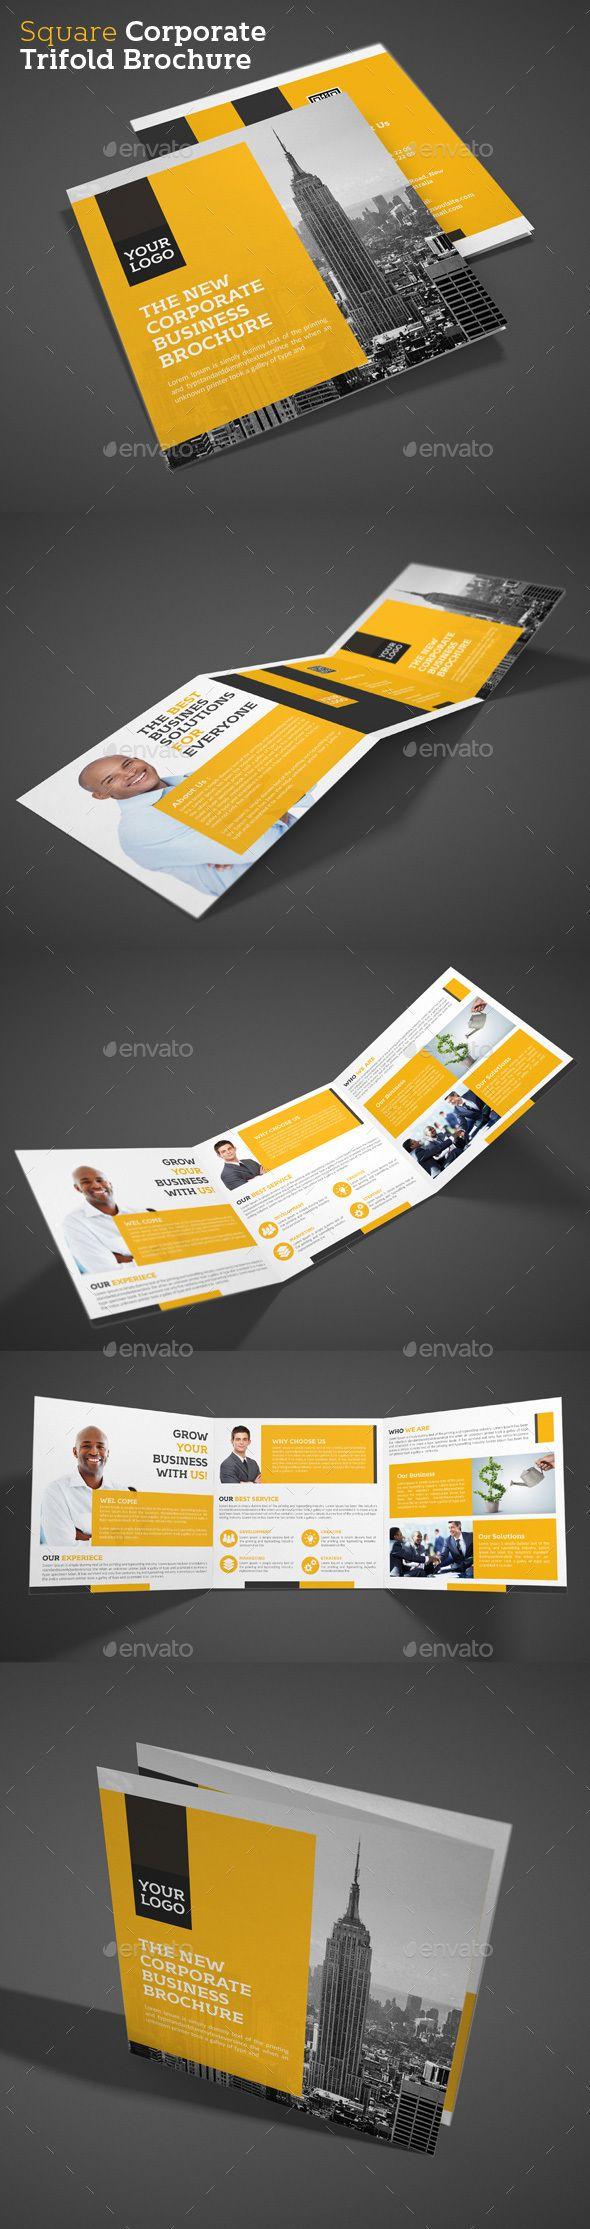 Square Corporate Trifold Brochure Template PSD Design Download - Brochure template photoshop